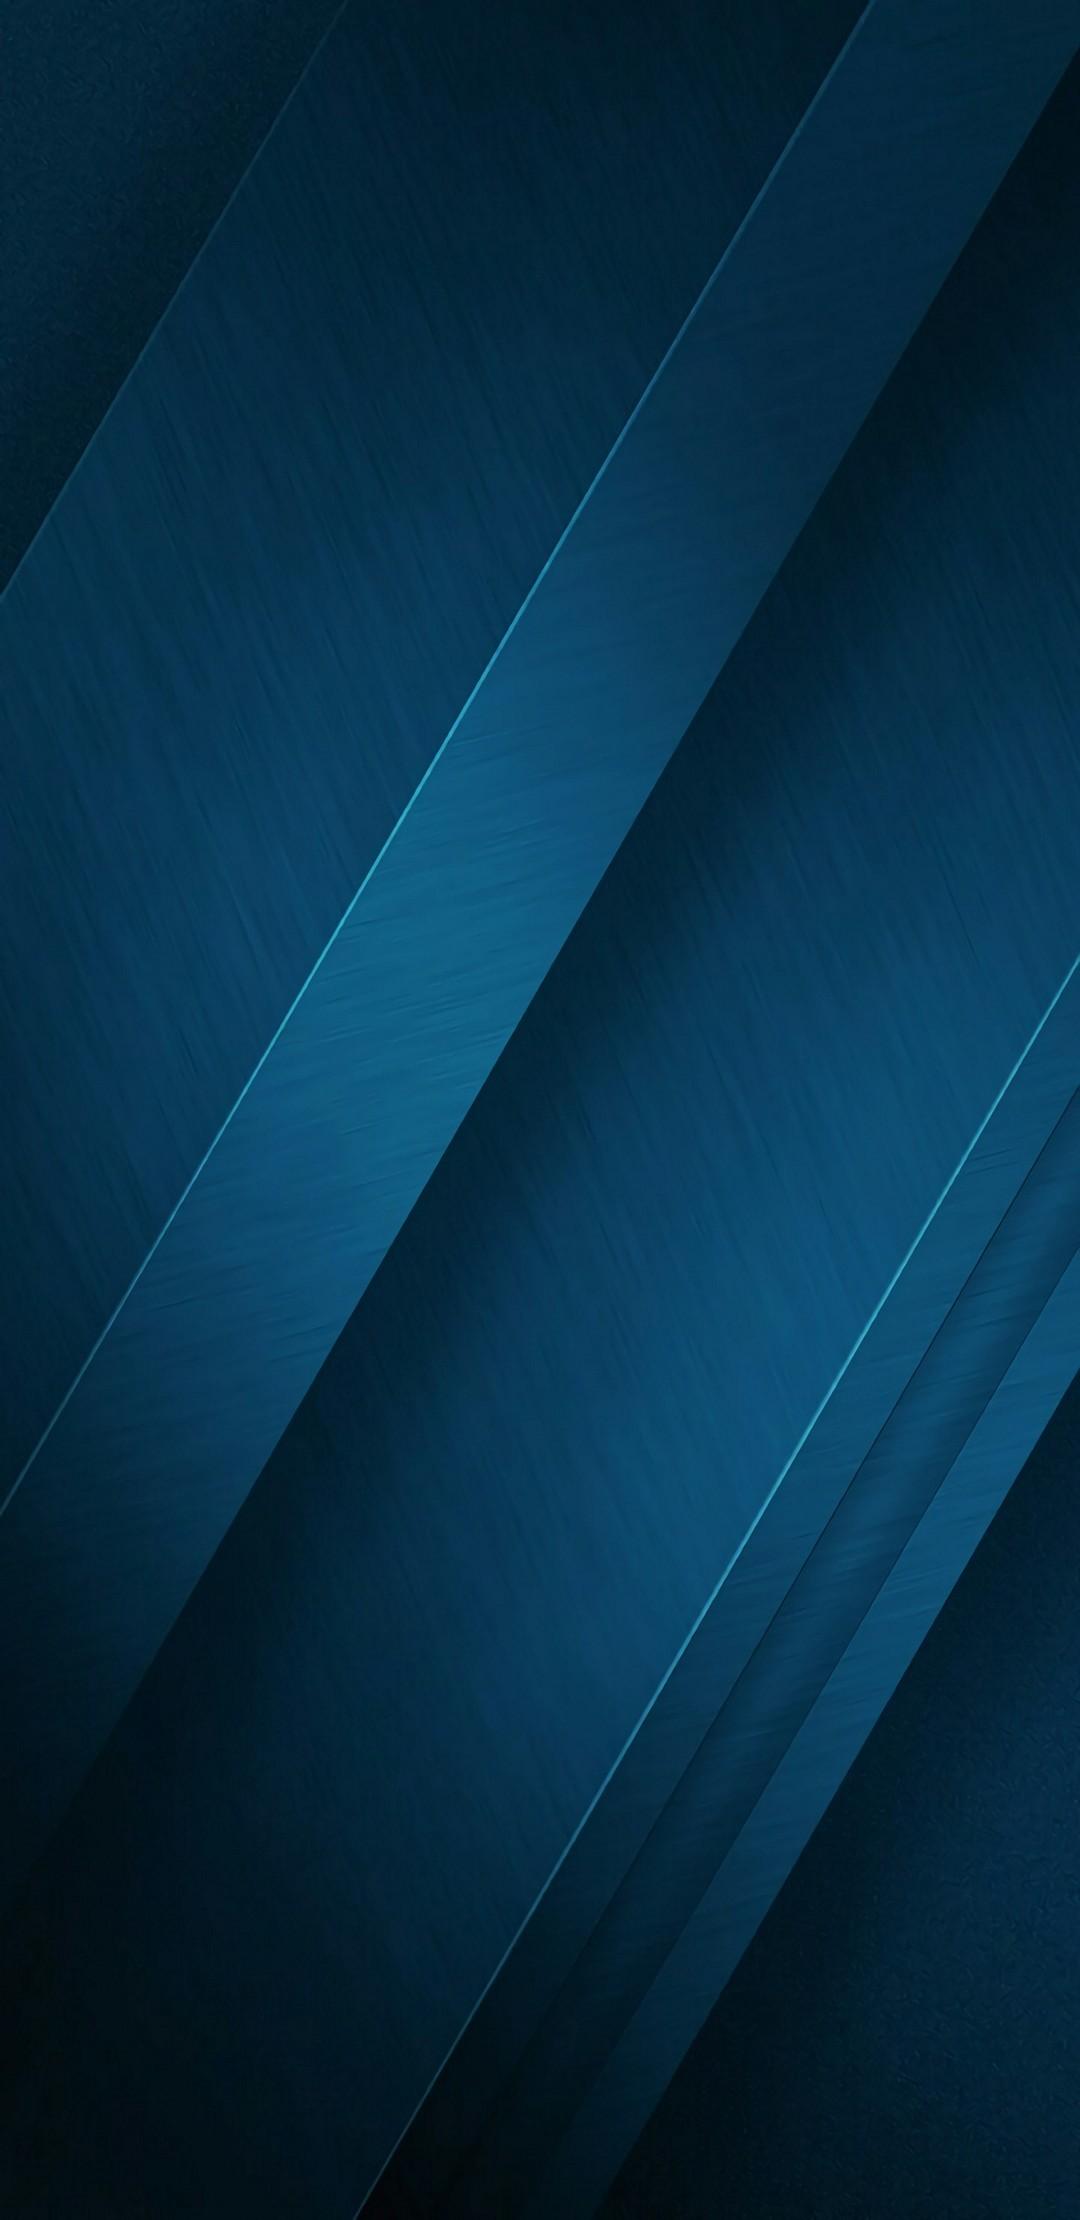 1080x2220 wallpaper 063 - 720 x 1080 wallpaper ...